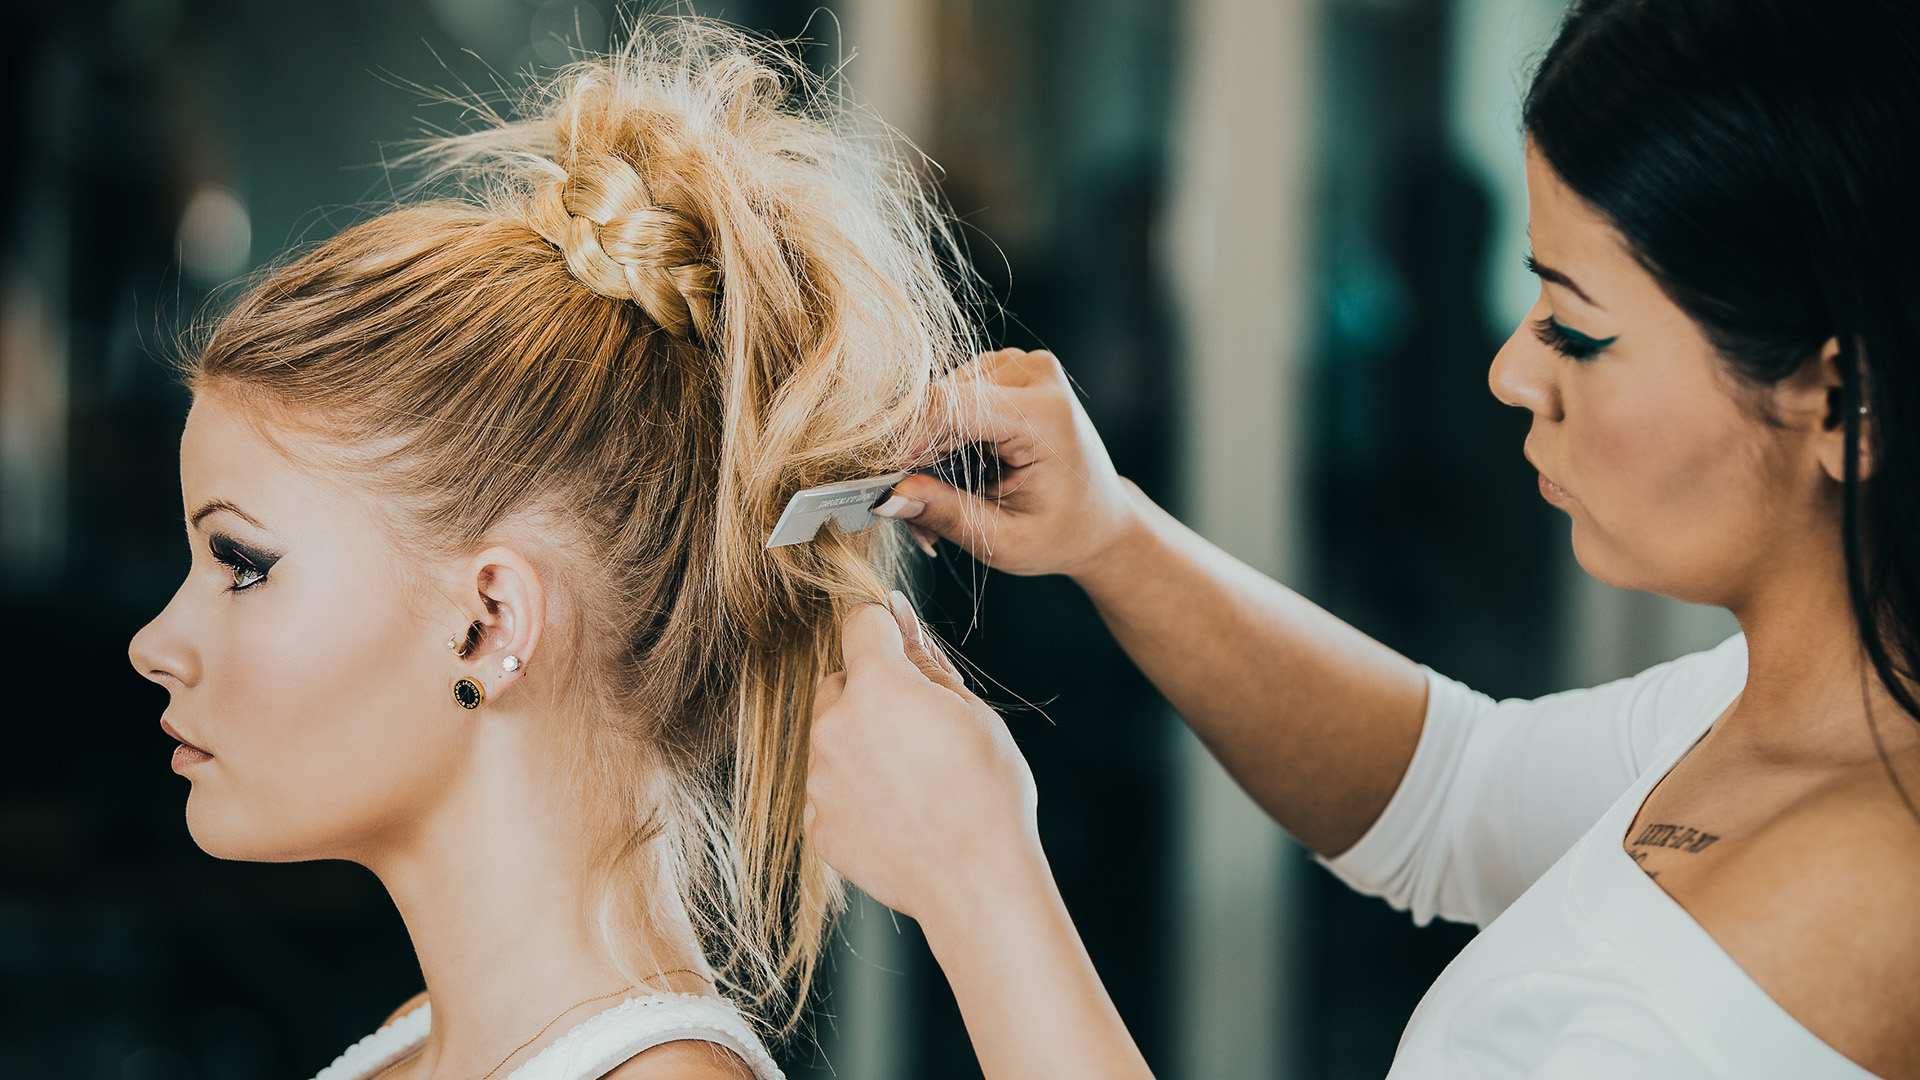 Ung kvinnlig frisör kammar kvinnas hår.